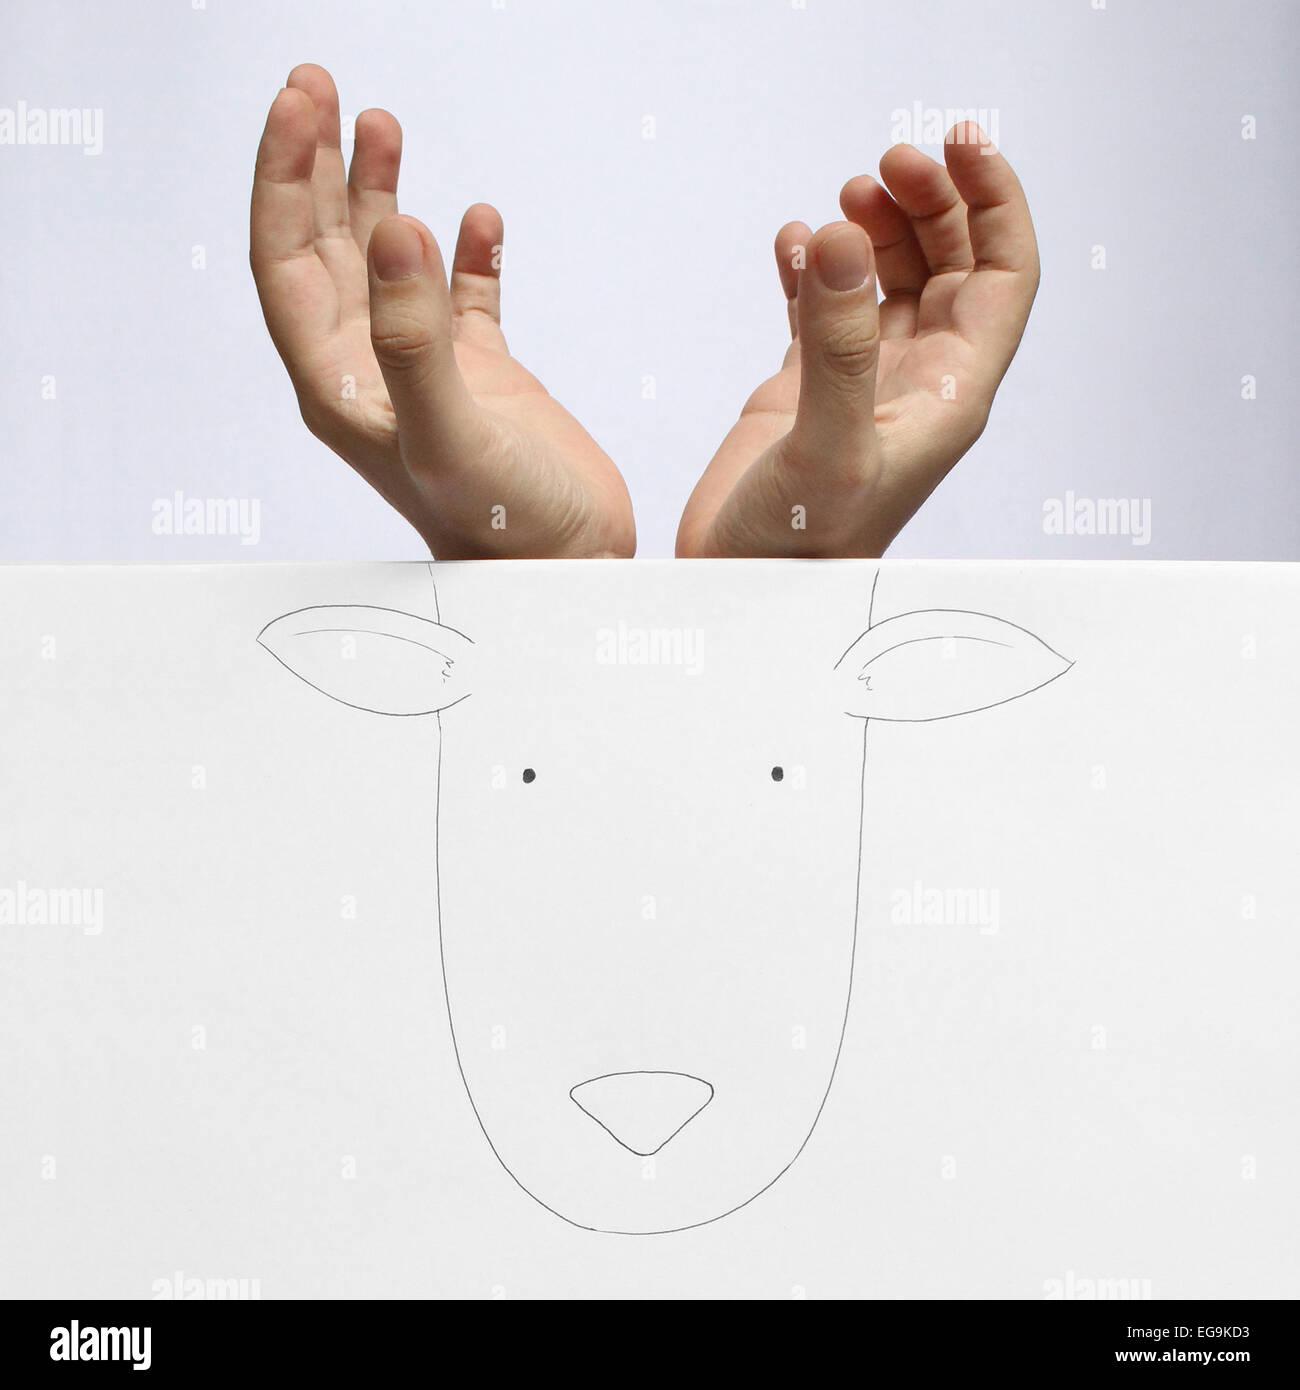 Imagen conceptual de ciervo Imagen De Stock